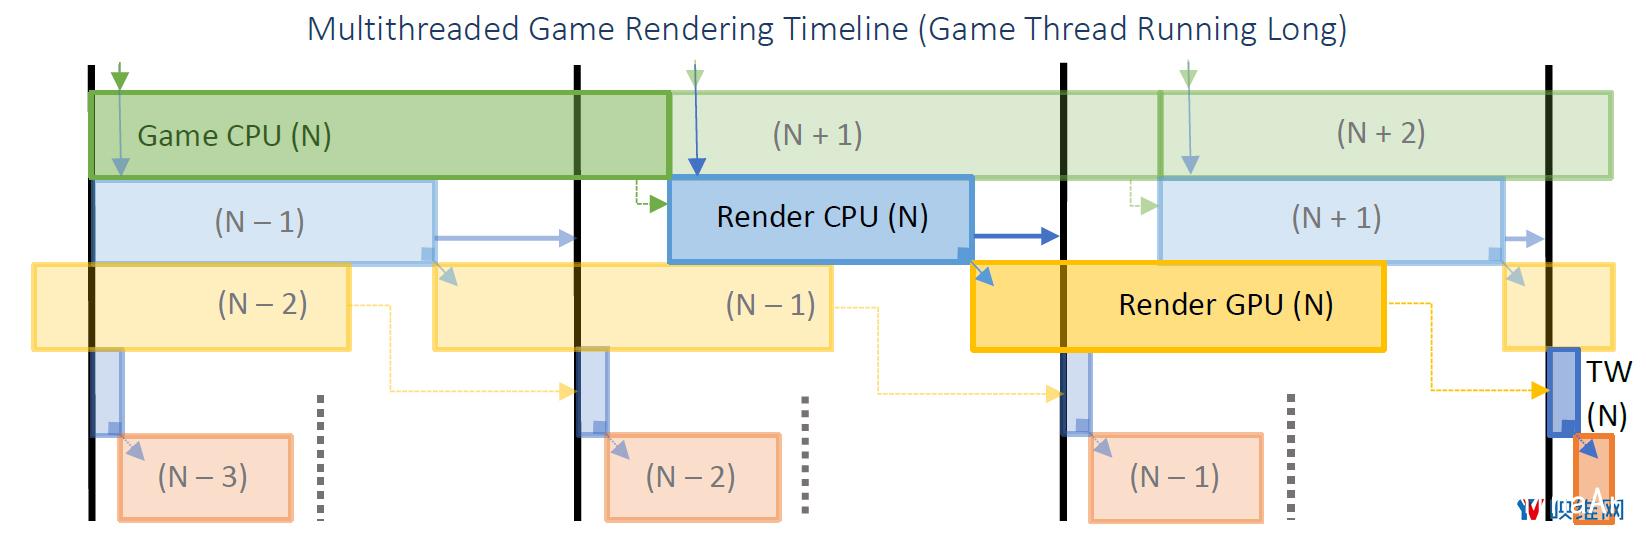 Oculus详述『延迟』问题及对应『帧渲染』解决方案 资源教程 第8张